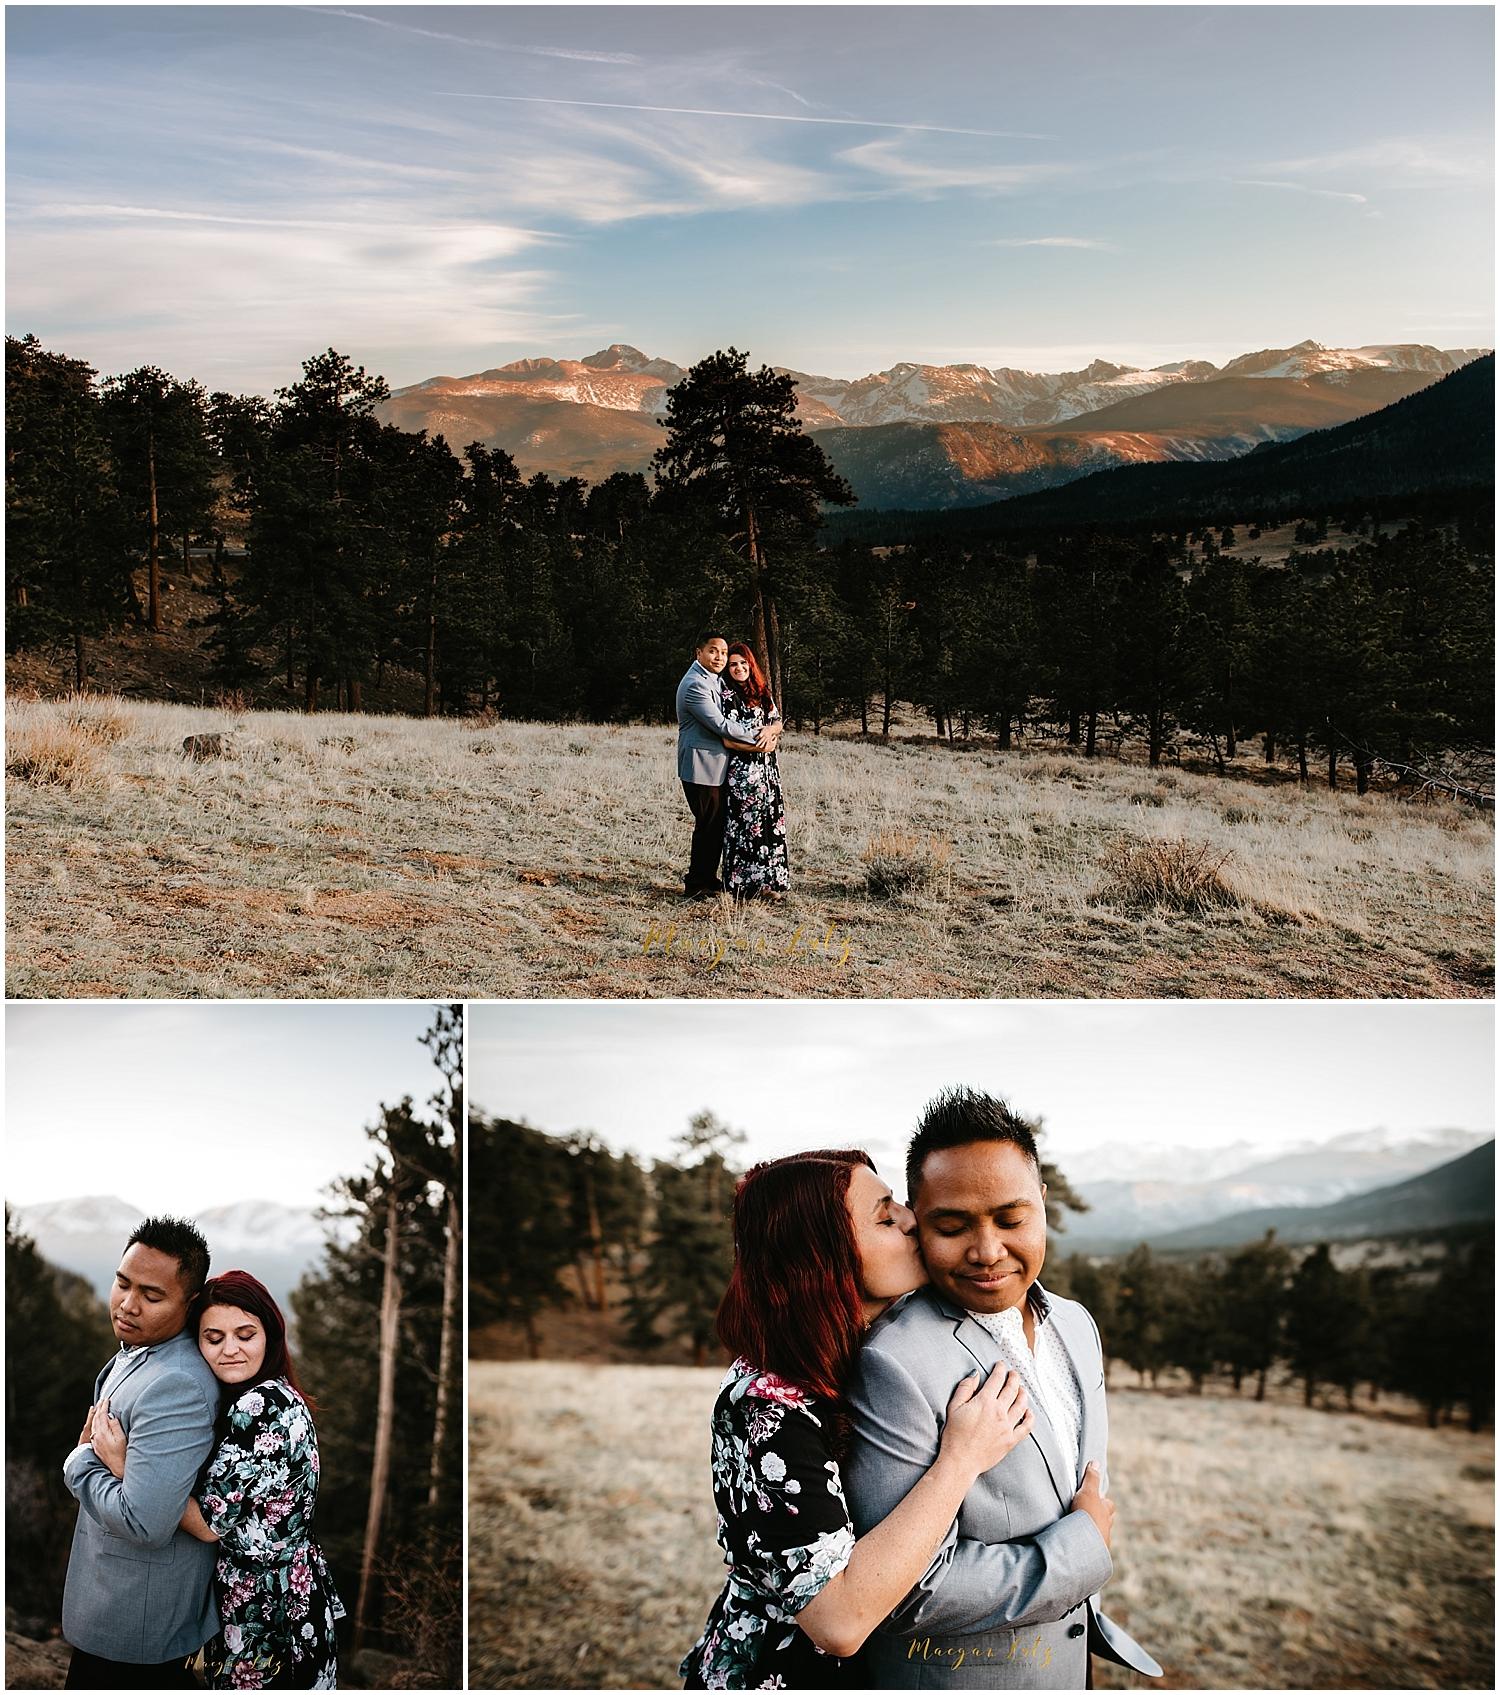 Destination-engagement-wedding-photographer-Colorado-Rocky-Mountain-National-Park-Session_0048.jpg